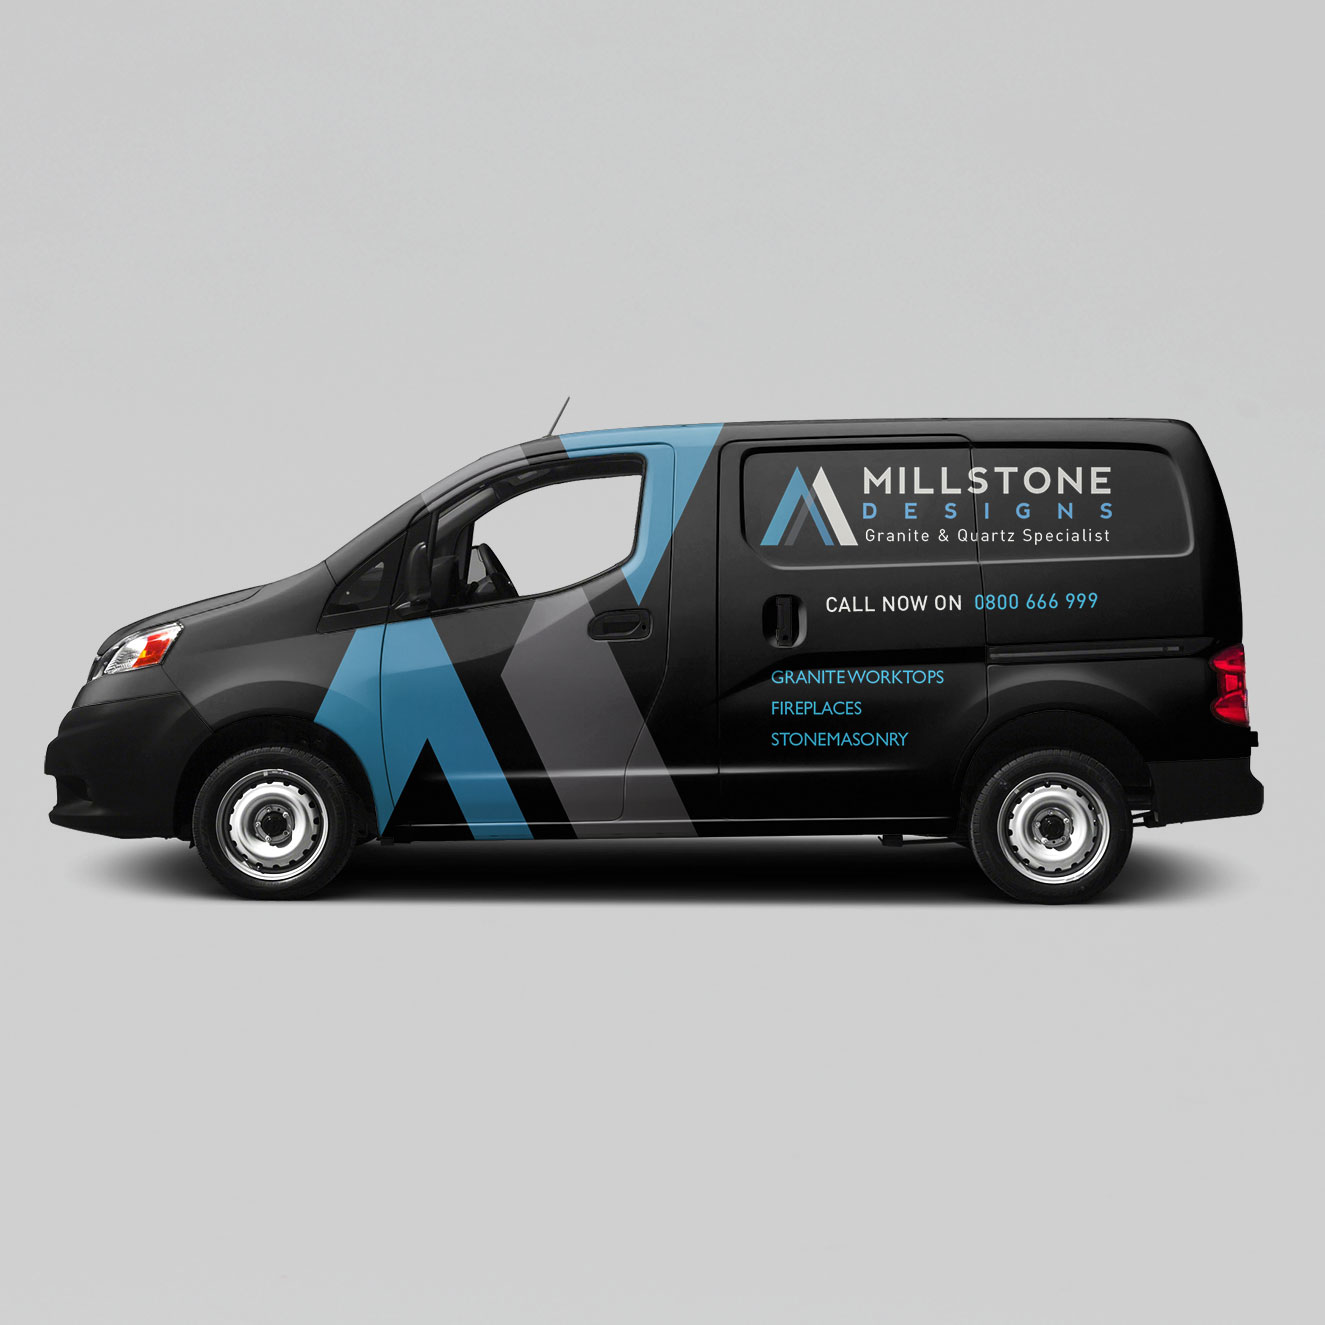 Millstone Design